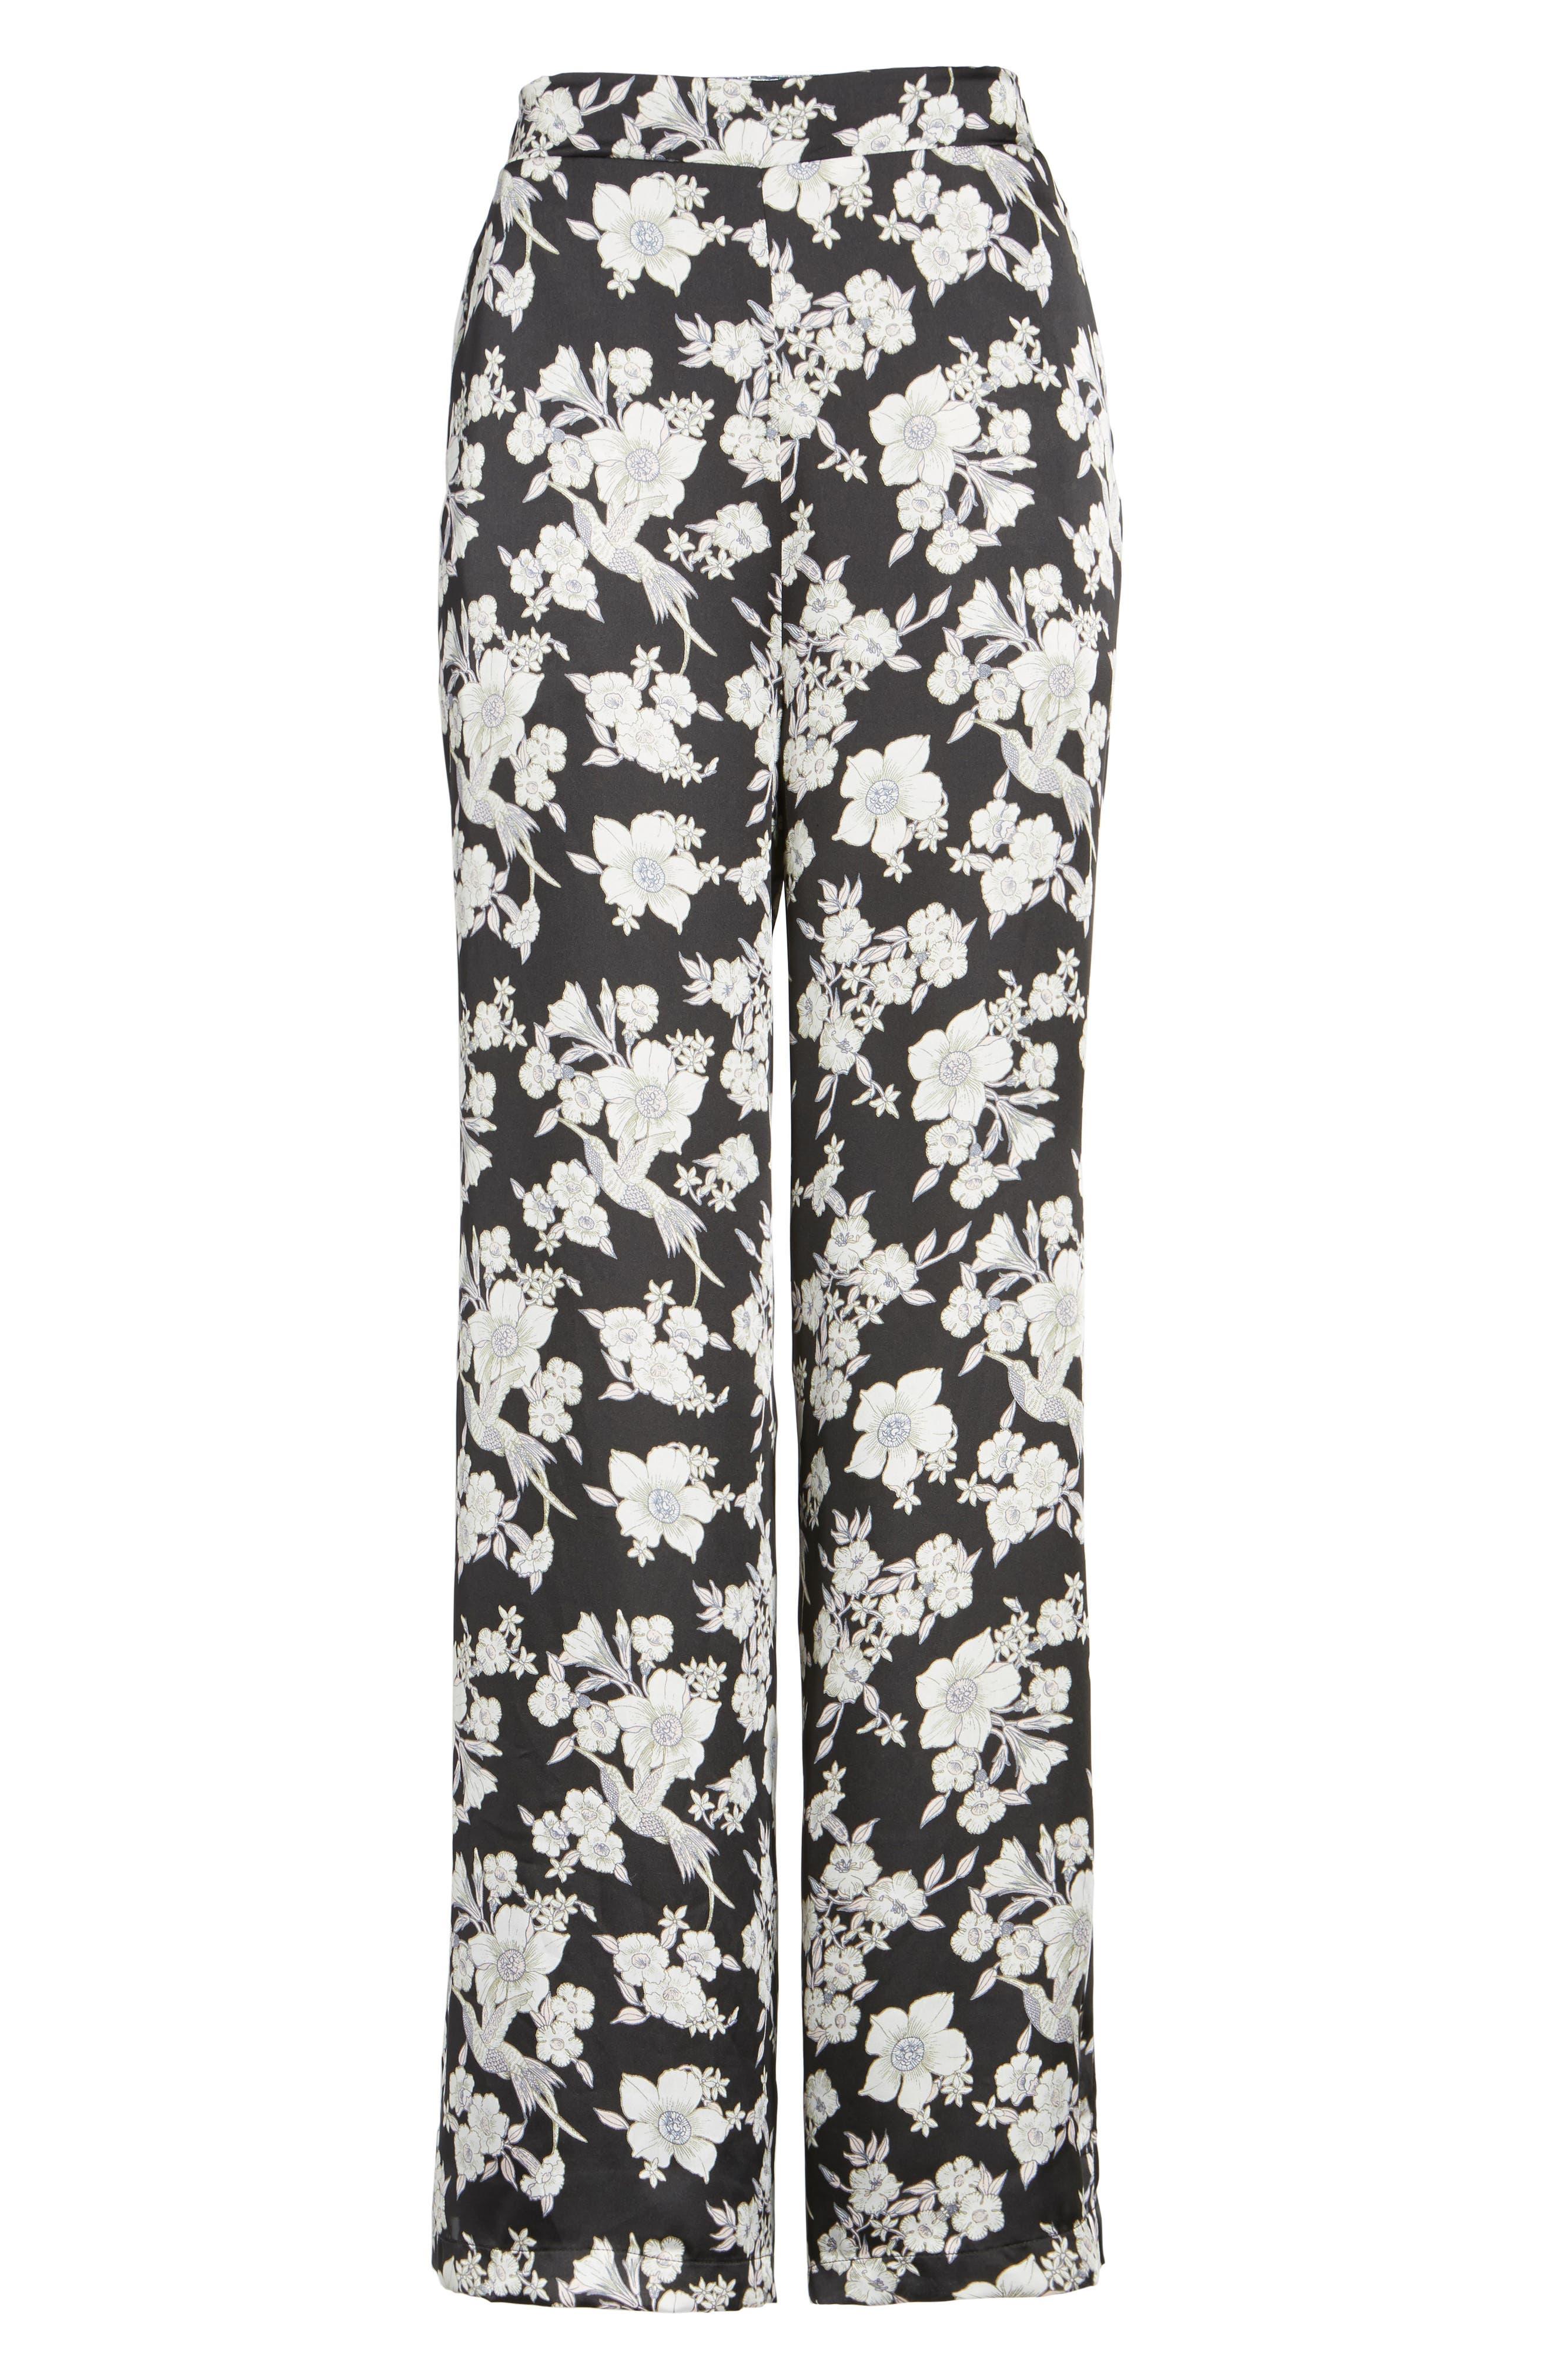 Birdee Wide Leg Pants,                             Alternate thumbnail 6, color,                             Black Floral